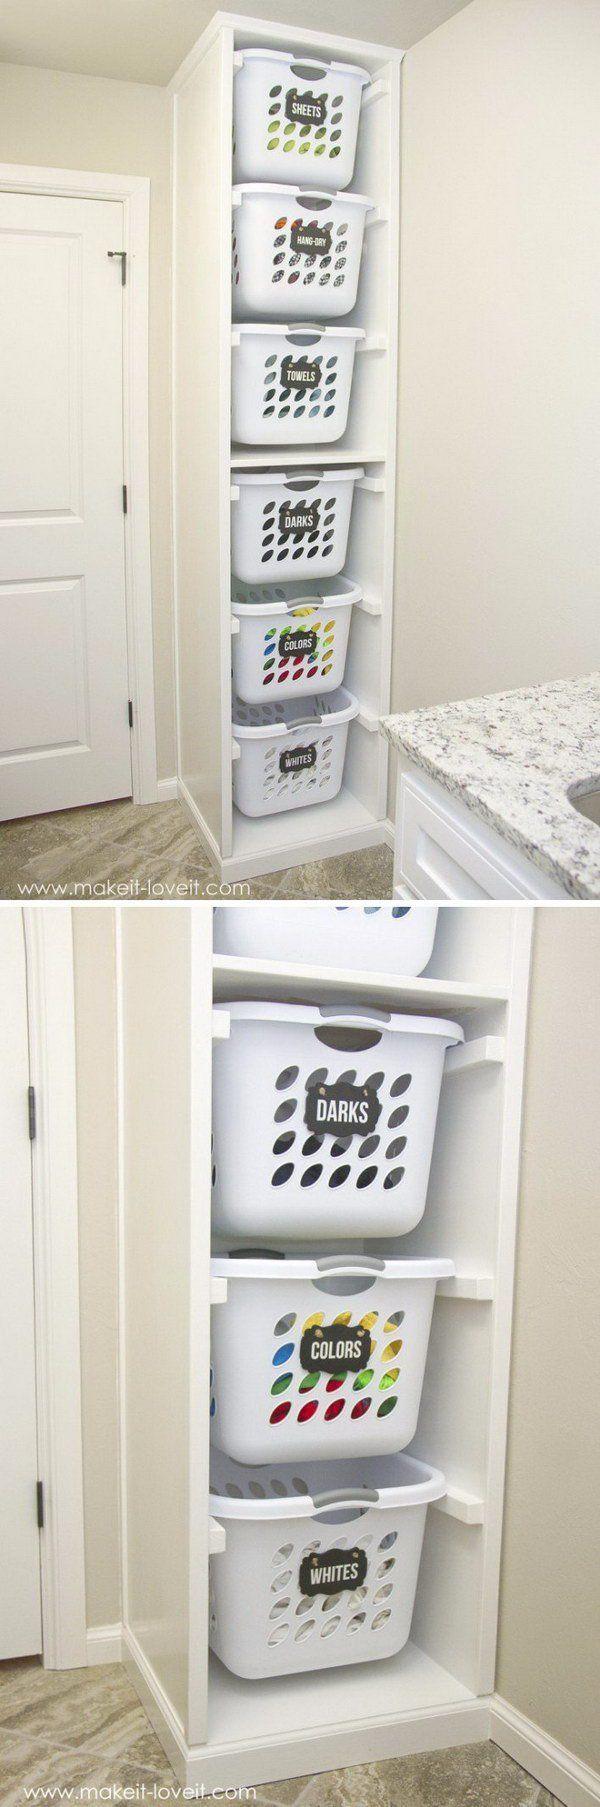 Best 25+ Cheap laundry baskets ideas on Pinterest | Hanging ...